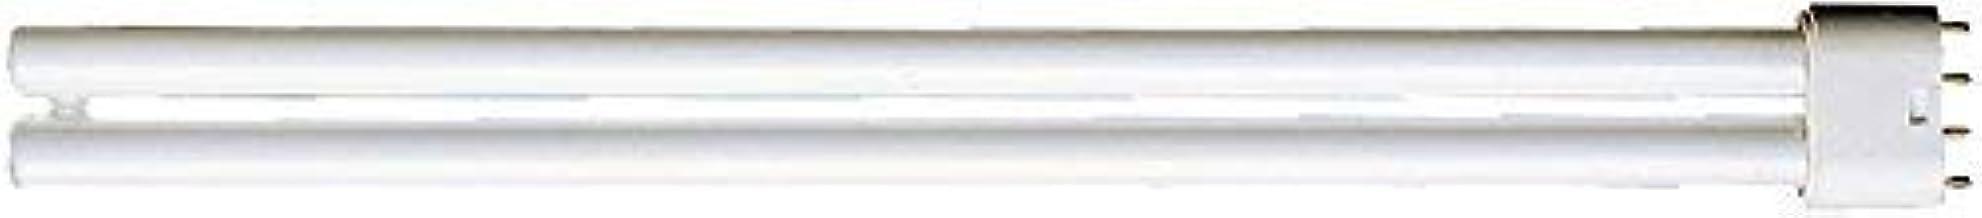 Brennenstuhl Compacte fluorescentielamp 36W 2950lm 2G11 met sokkel, 1177510